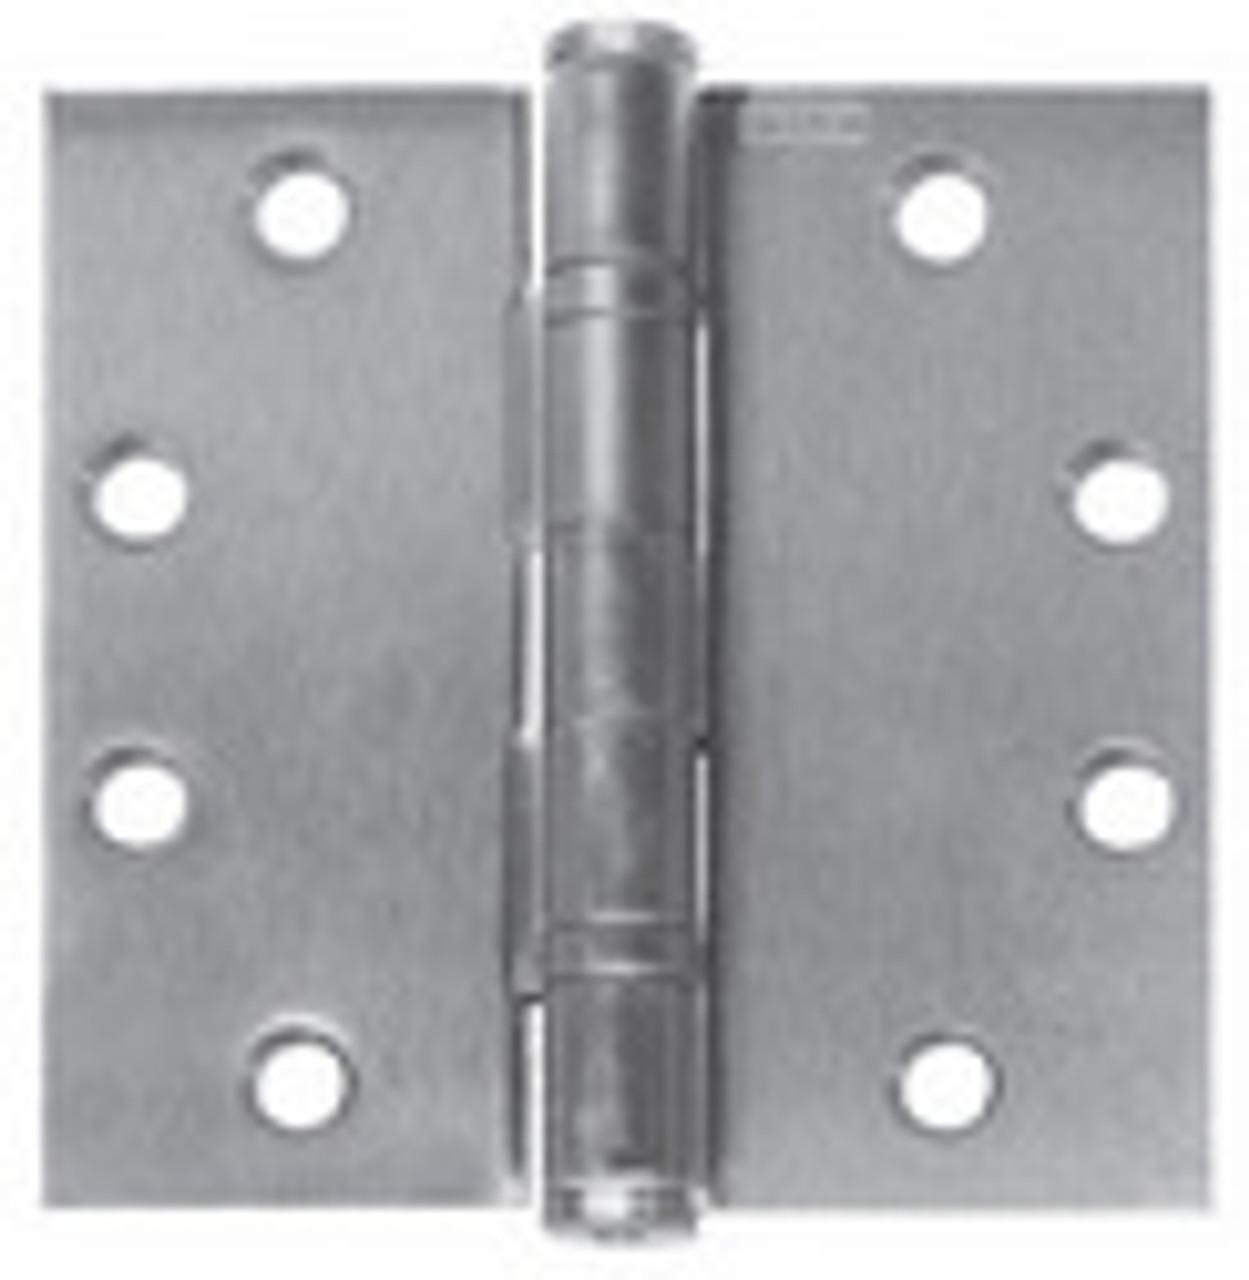 "CEFBB179 Stanley Electrified Hinge 4.5"" x 4.5"""